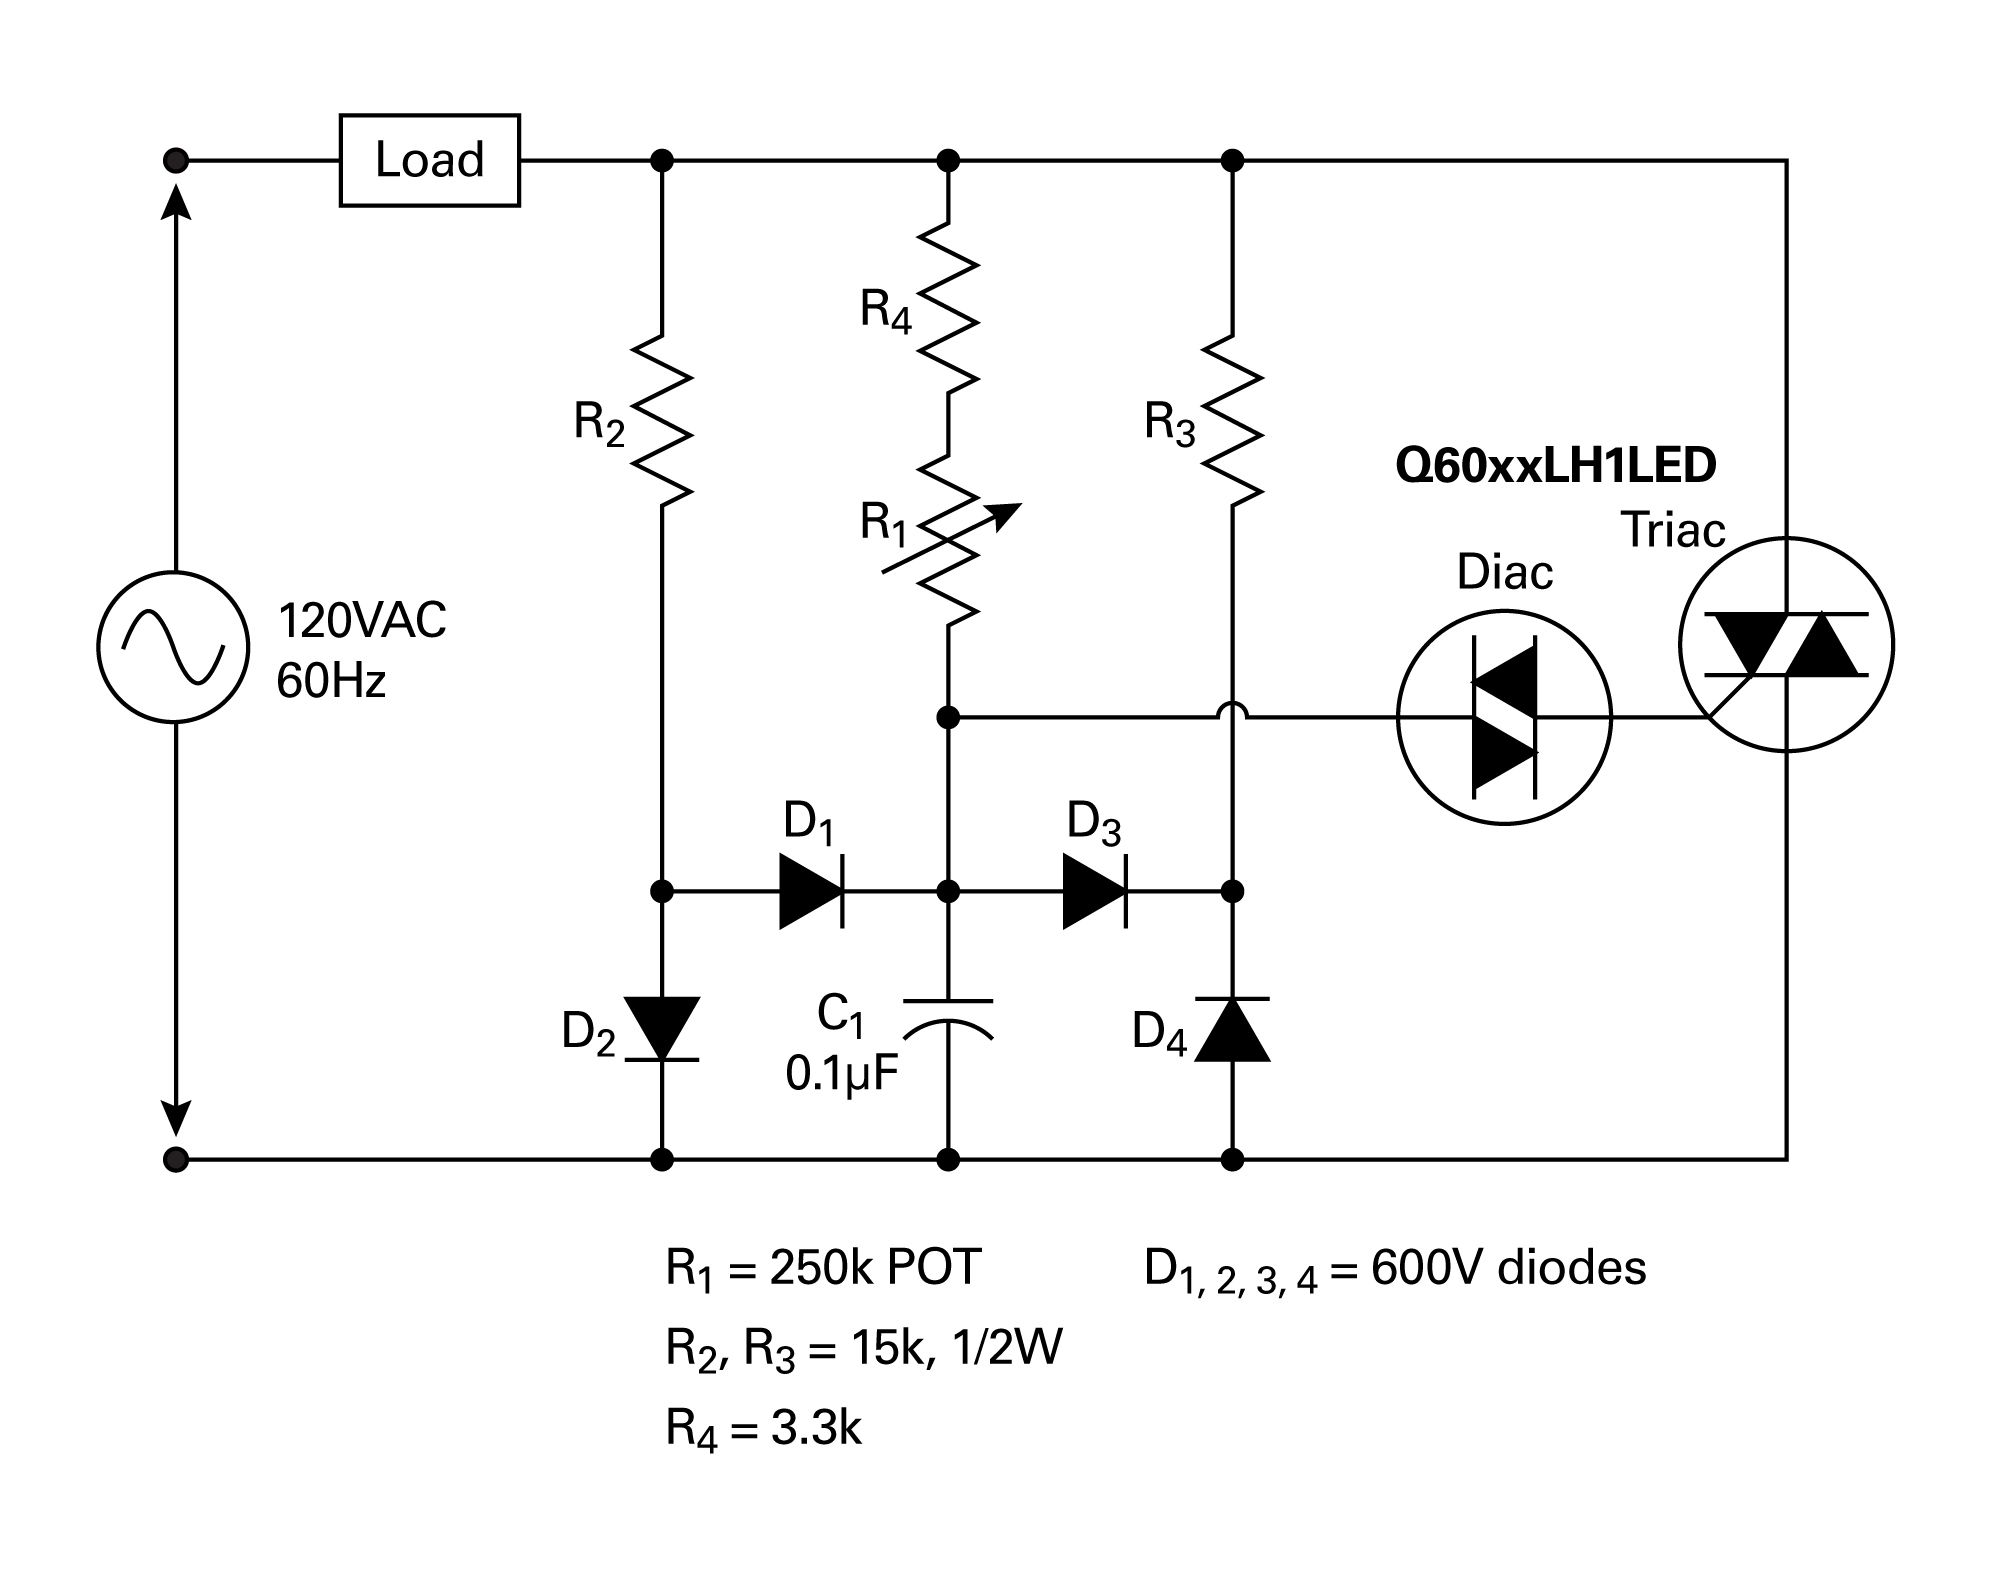 dimmer circuit using scr triac eleccircuitcom dimmers